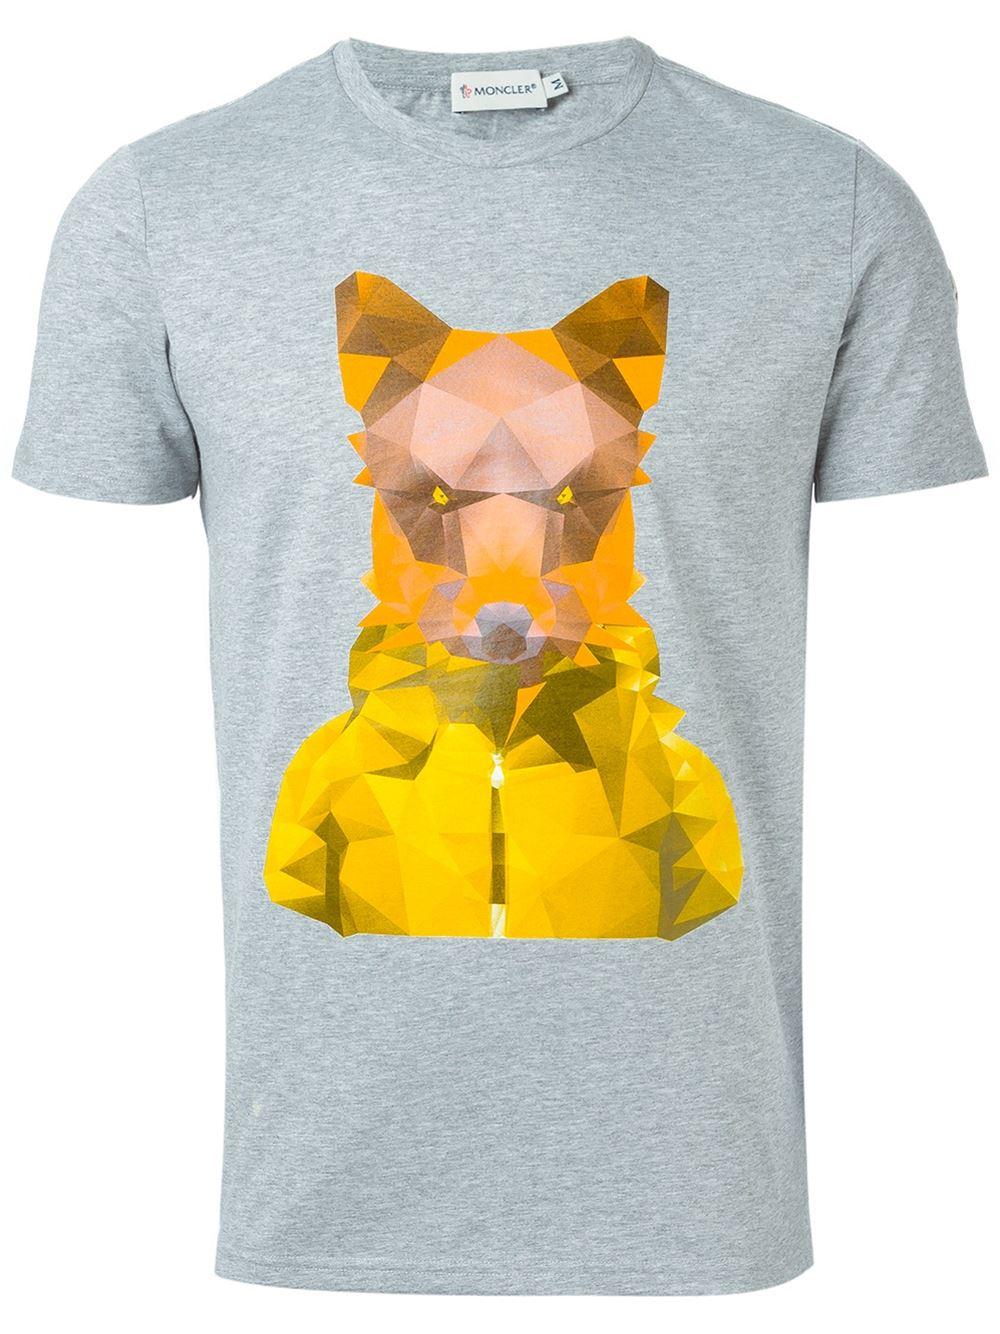 0d1f65cdb52c Lyst - Moncler Geometric Fox Print T-shirt in Gray for Men